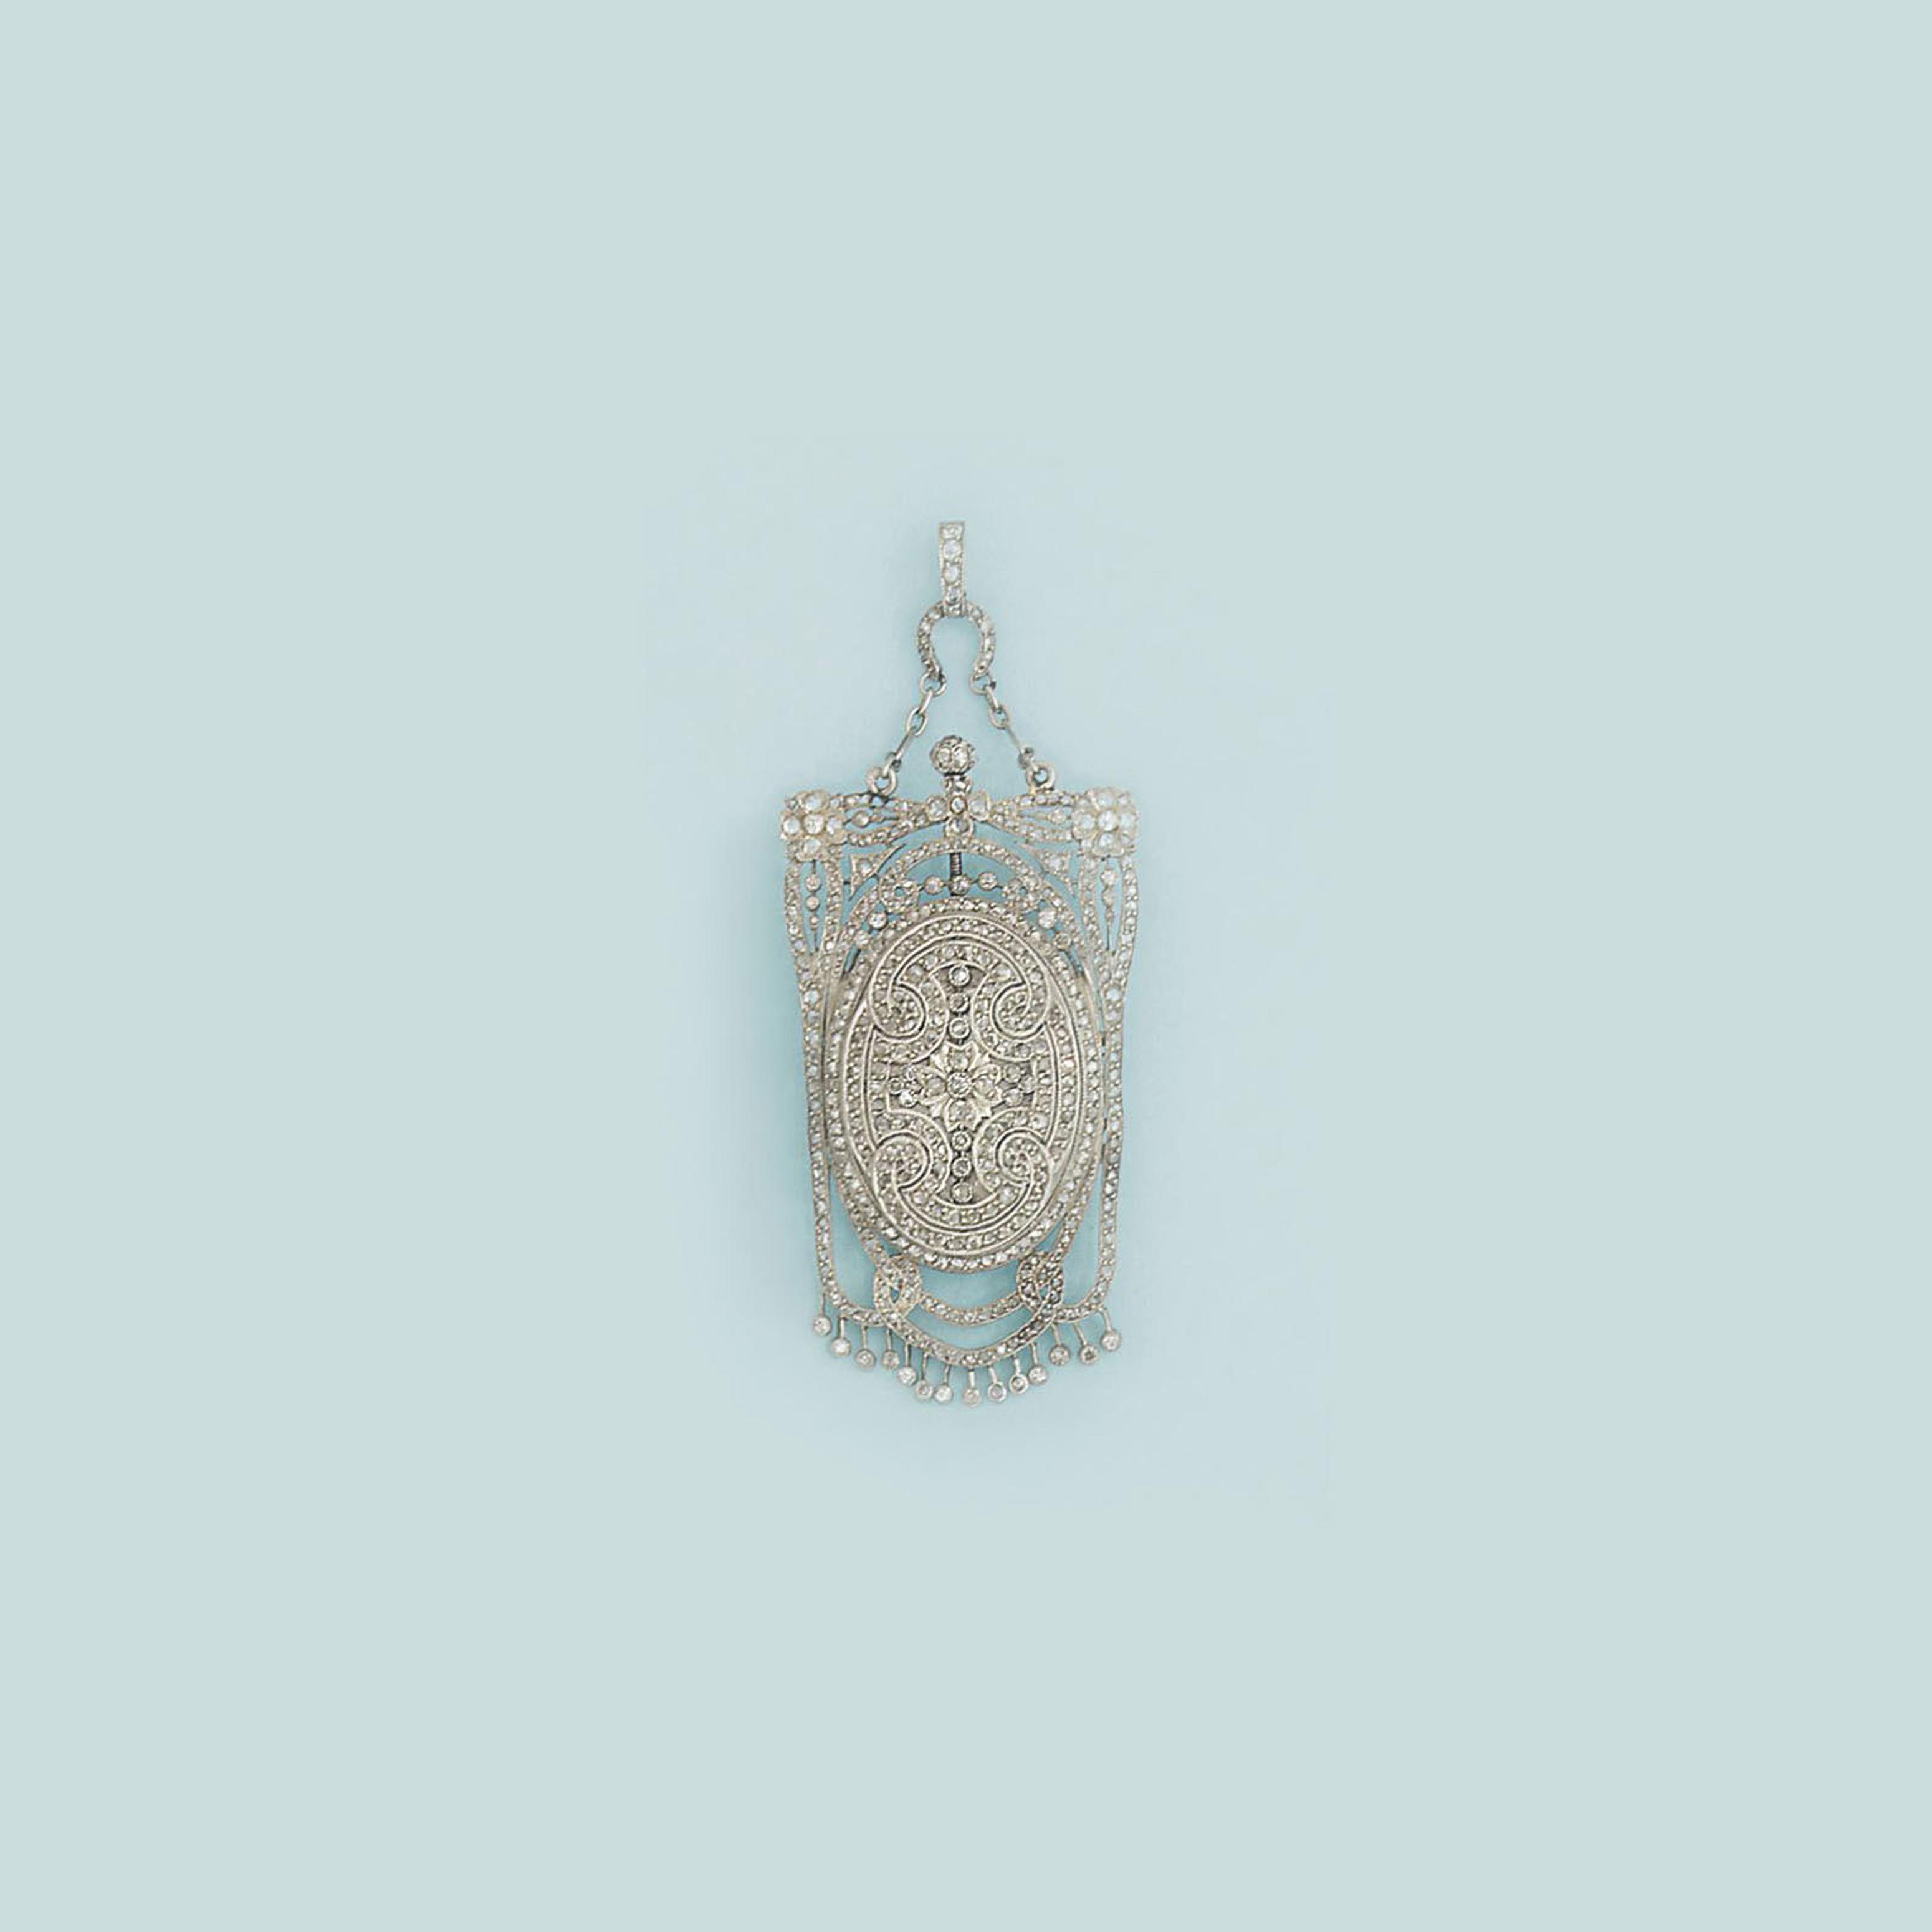 A Belle epoque diamond-set watch pendant